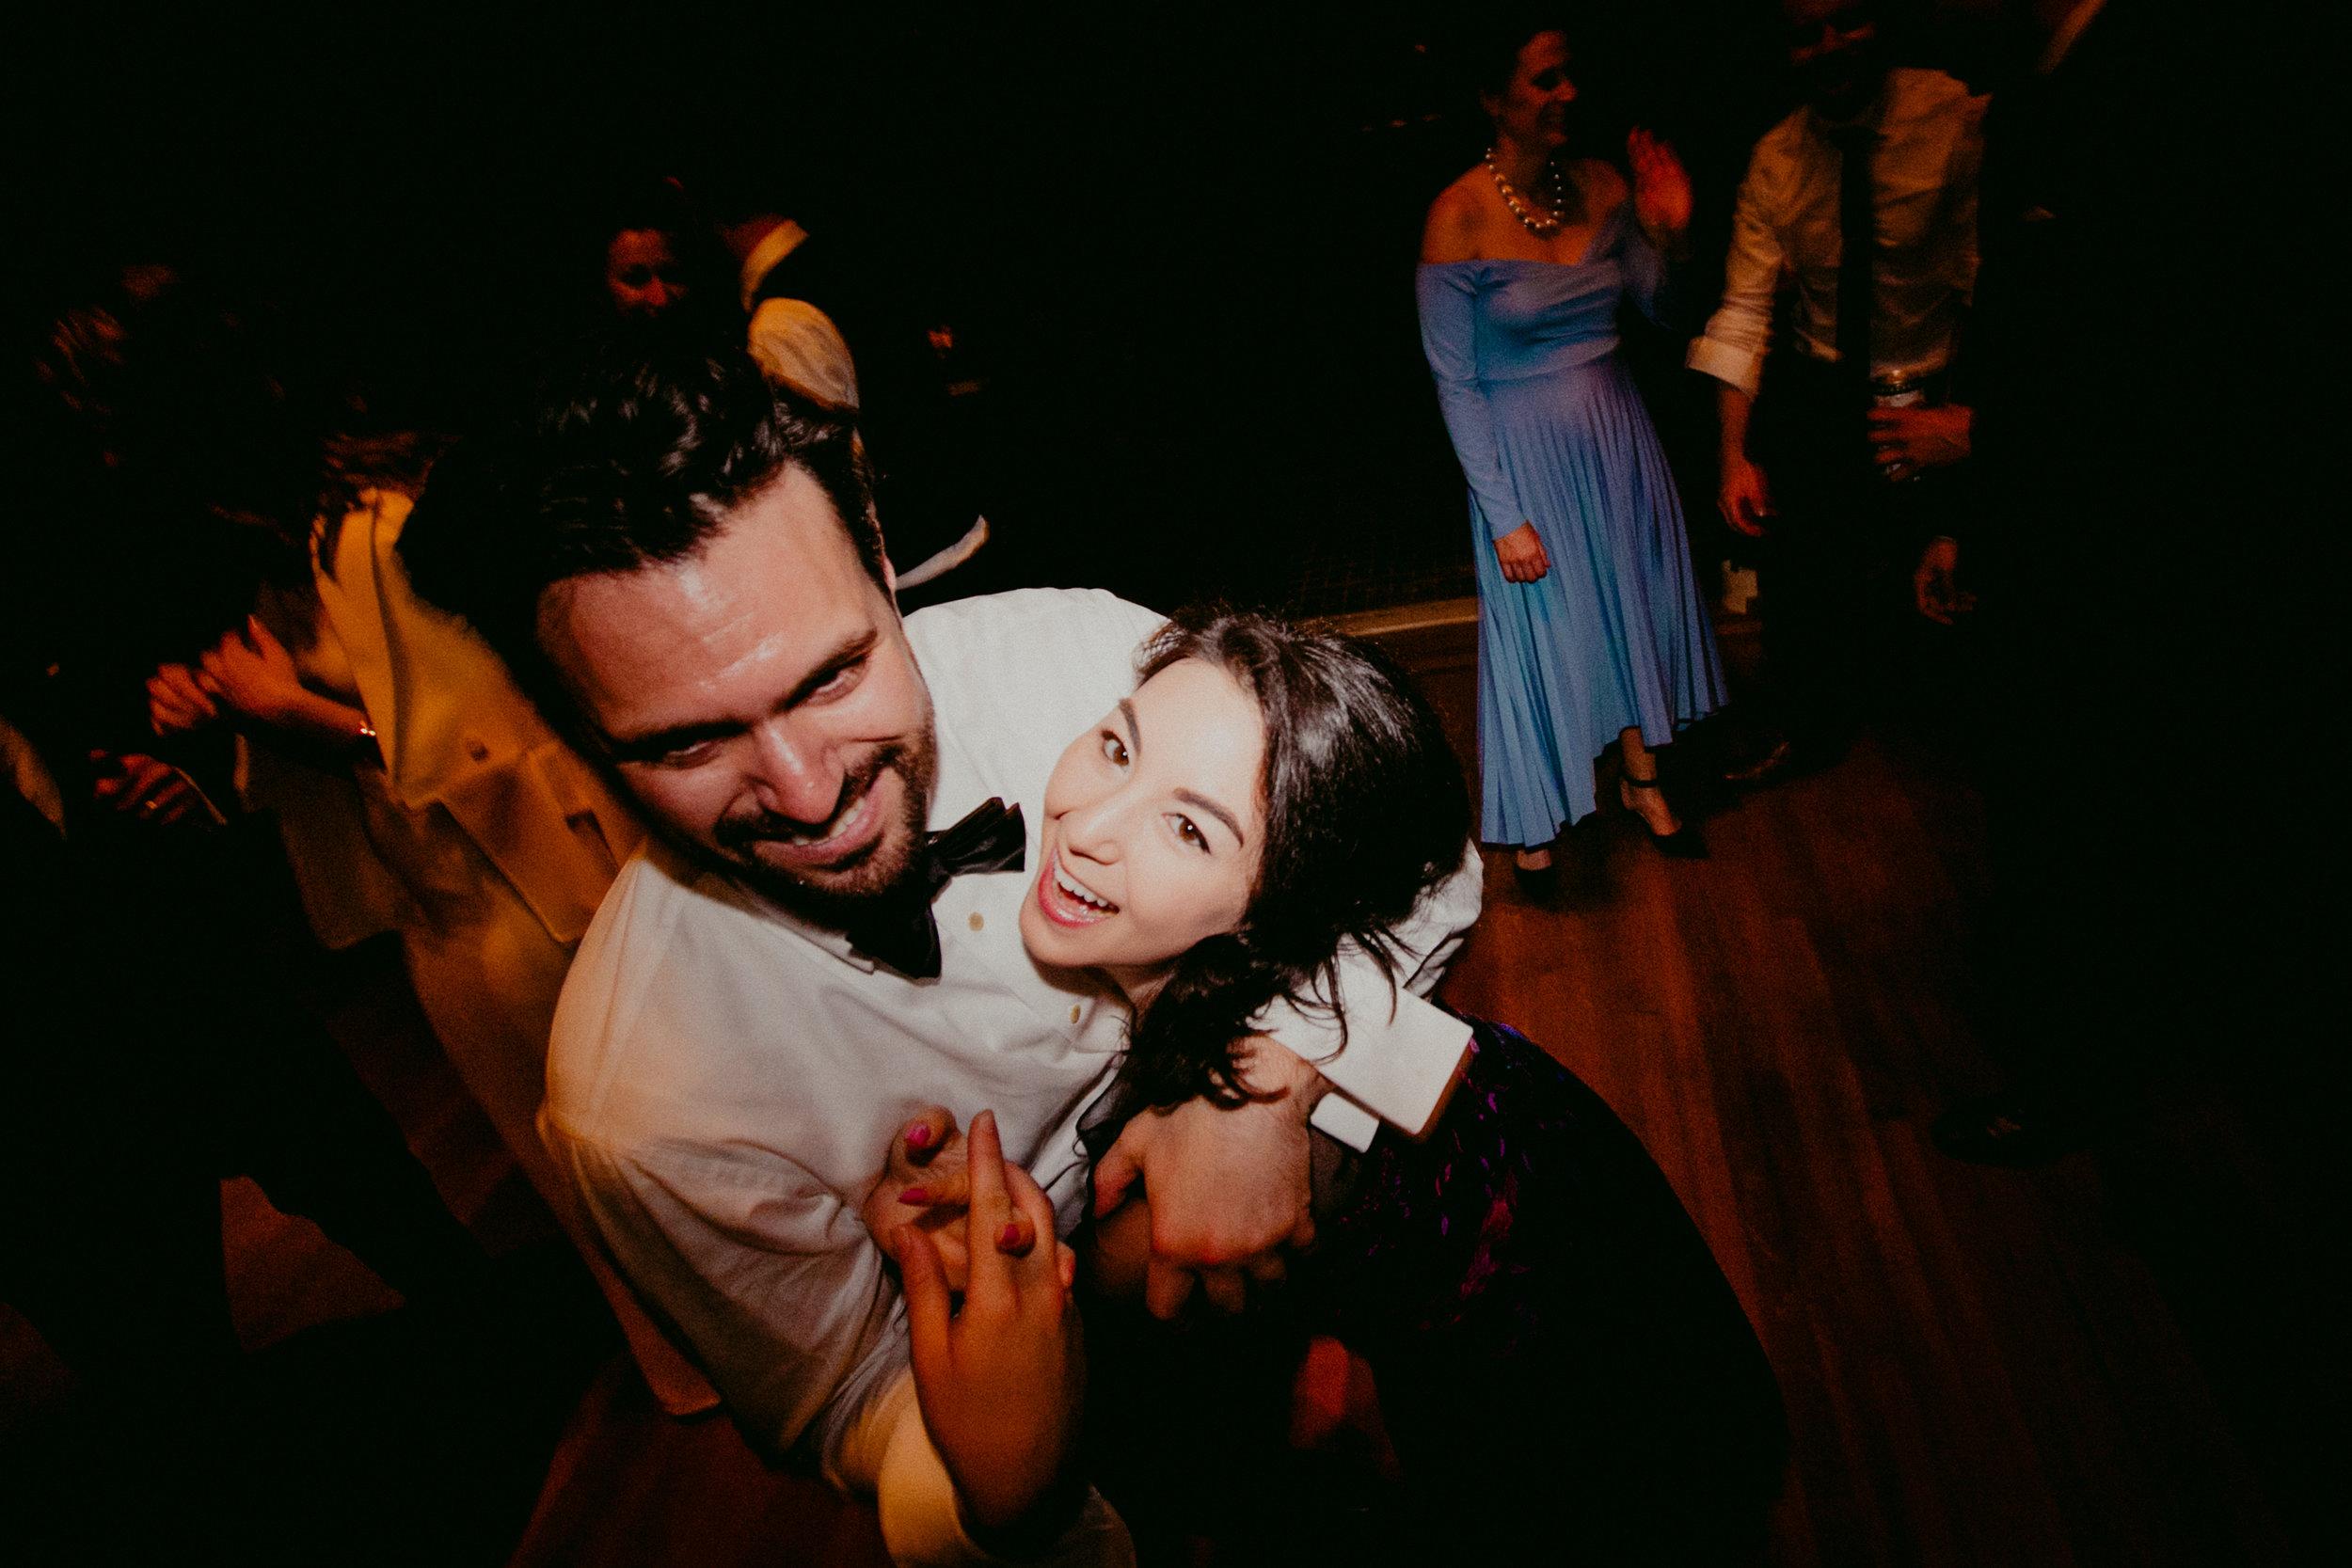 Tiger_House_The_Inn_at_Hudson-Wedding_Chellise_Michael_Photography-661.jpg